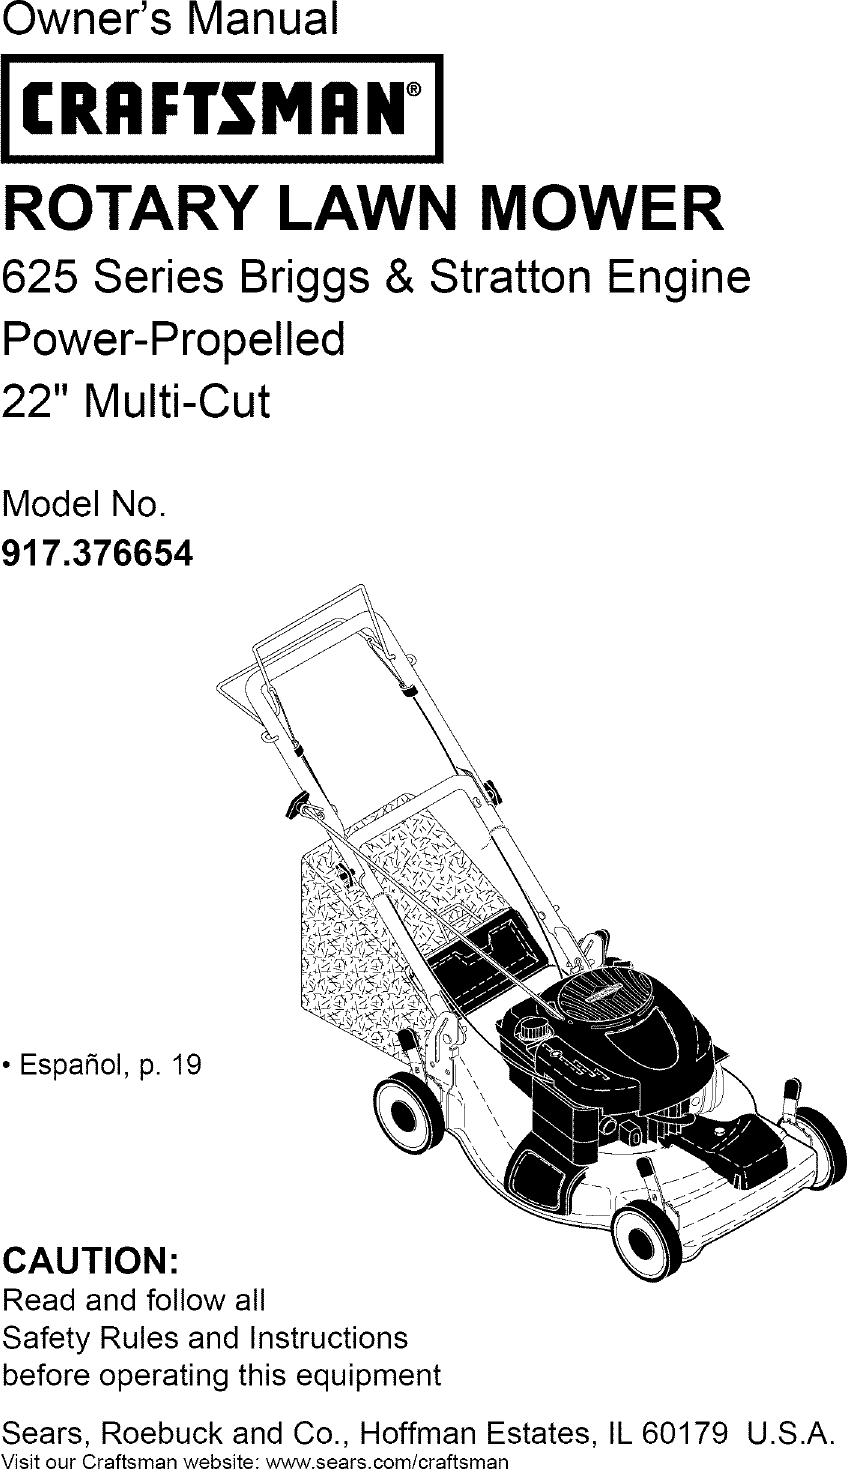 Craftsman 917376654 User Manual LAWN MOWER Manuals And